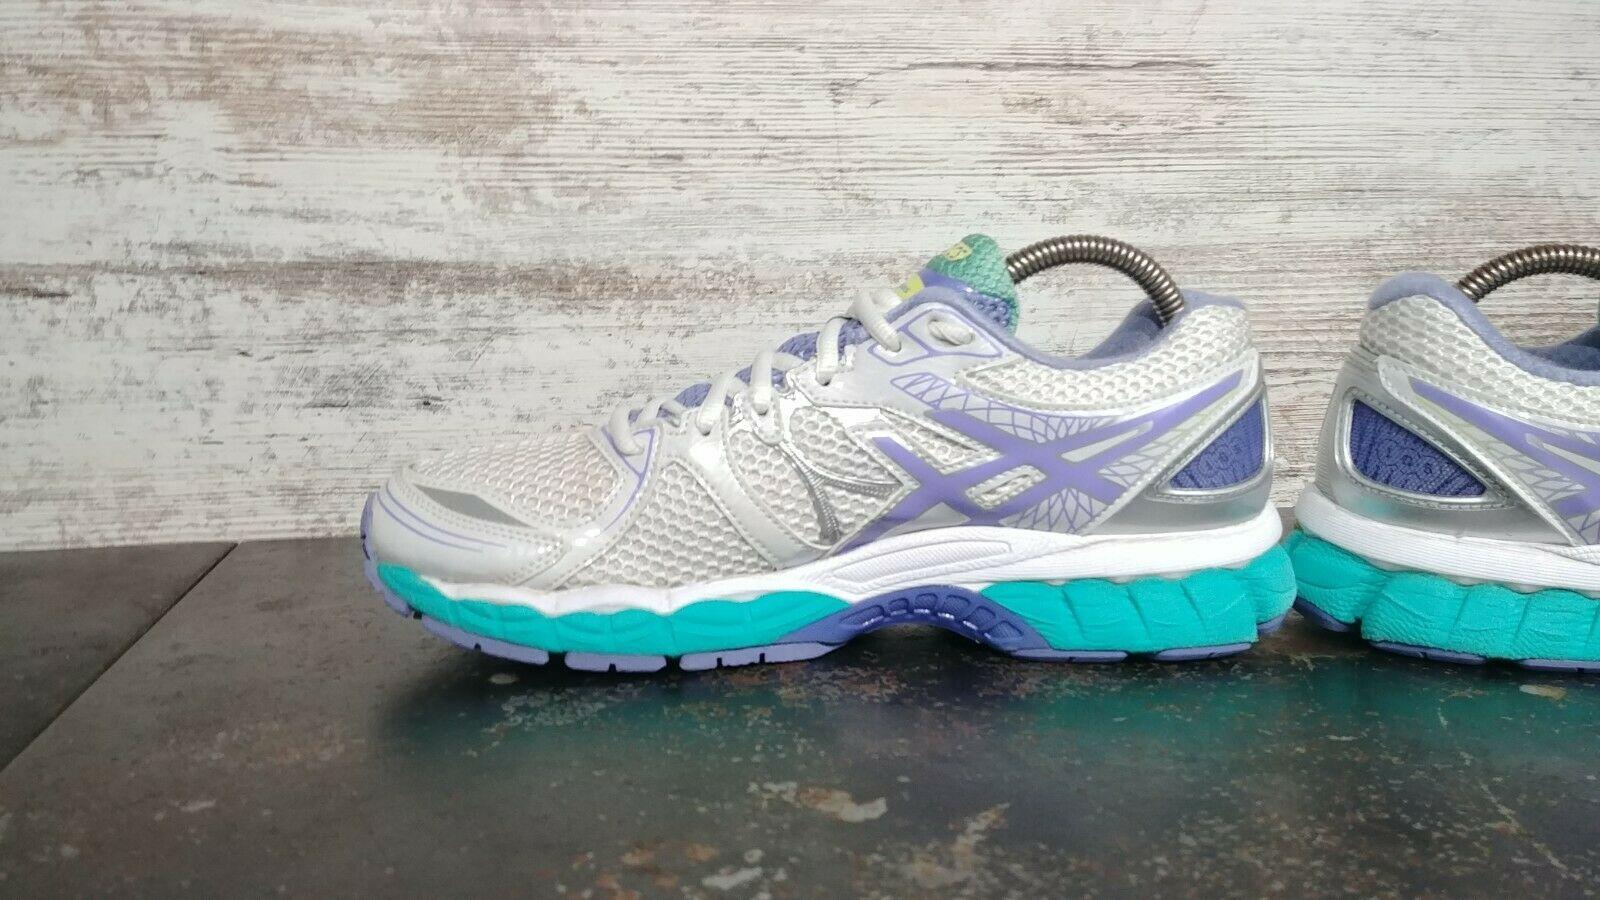 Womens Asics Gel Nimbus 16 Running Shoes SZ 8.5 40 B Used Sneakers Trainers image 7